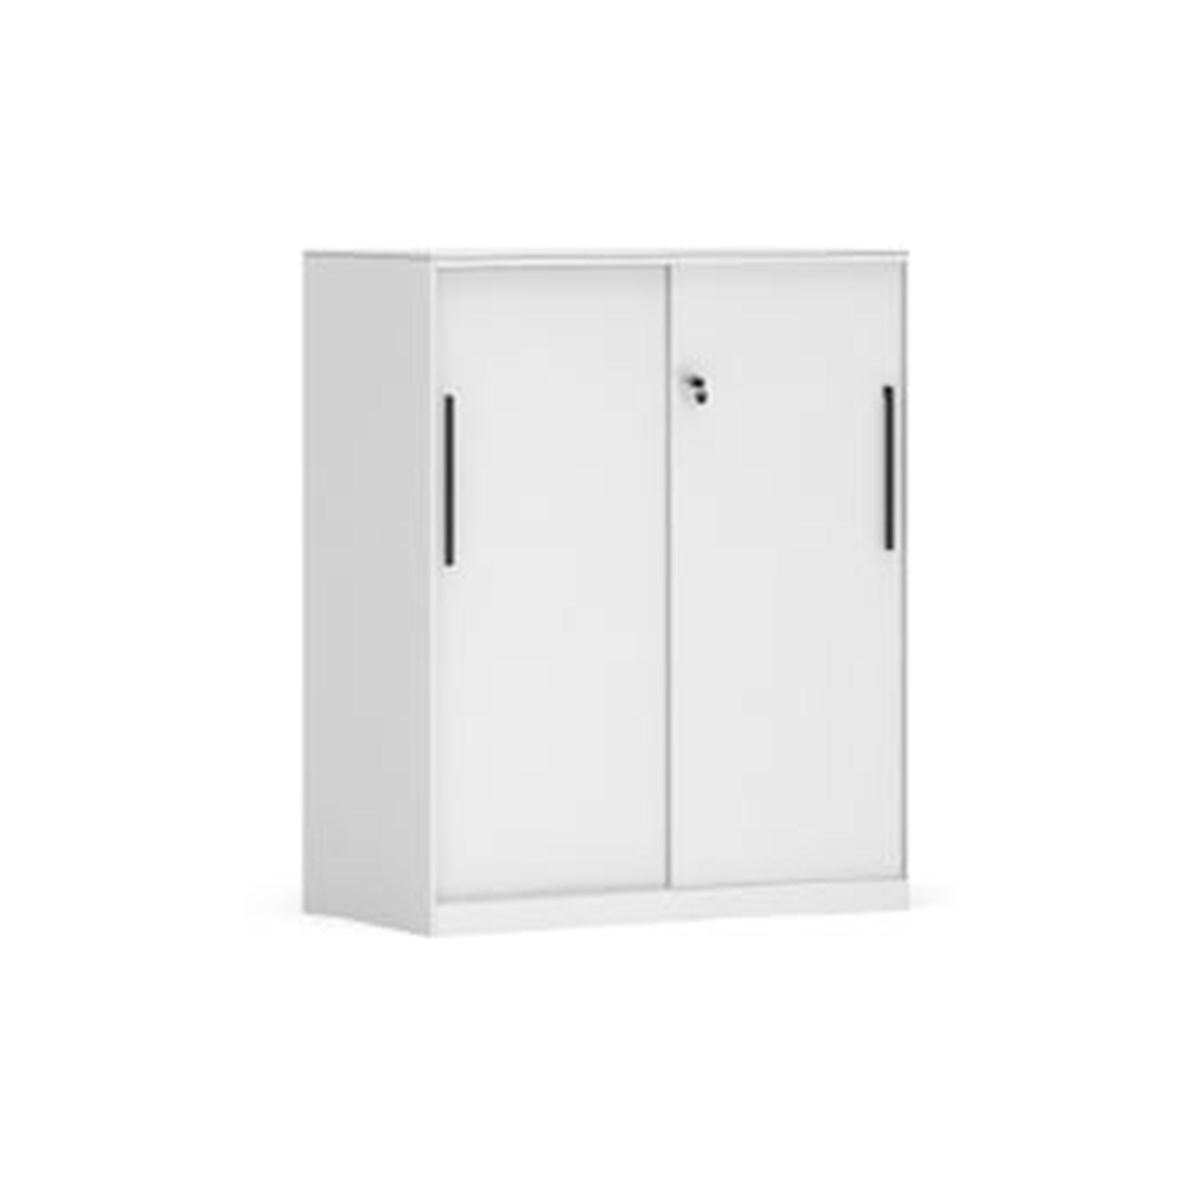 Neospace-Sliding-Door-Cabinet-Tall-Matisse-1